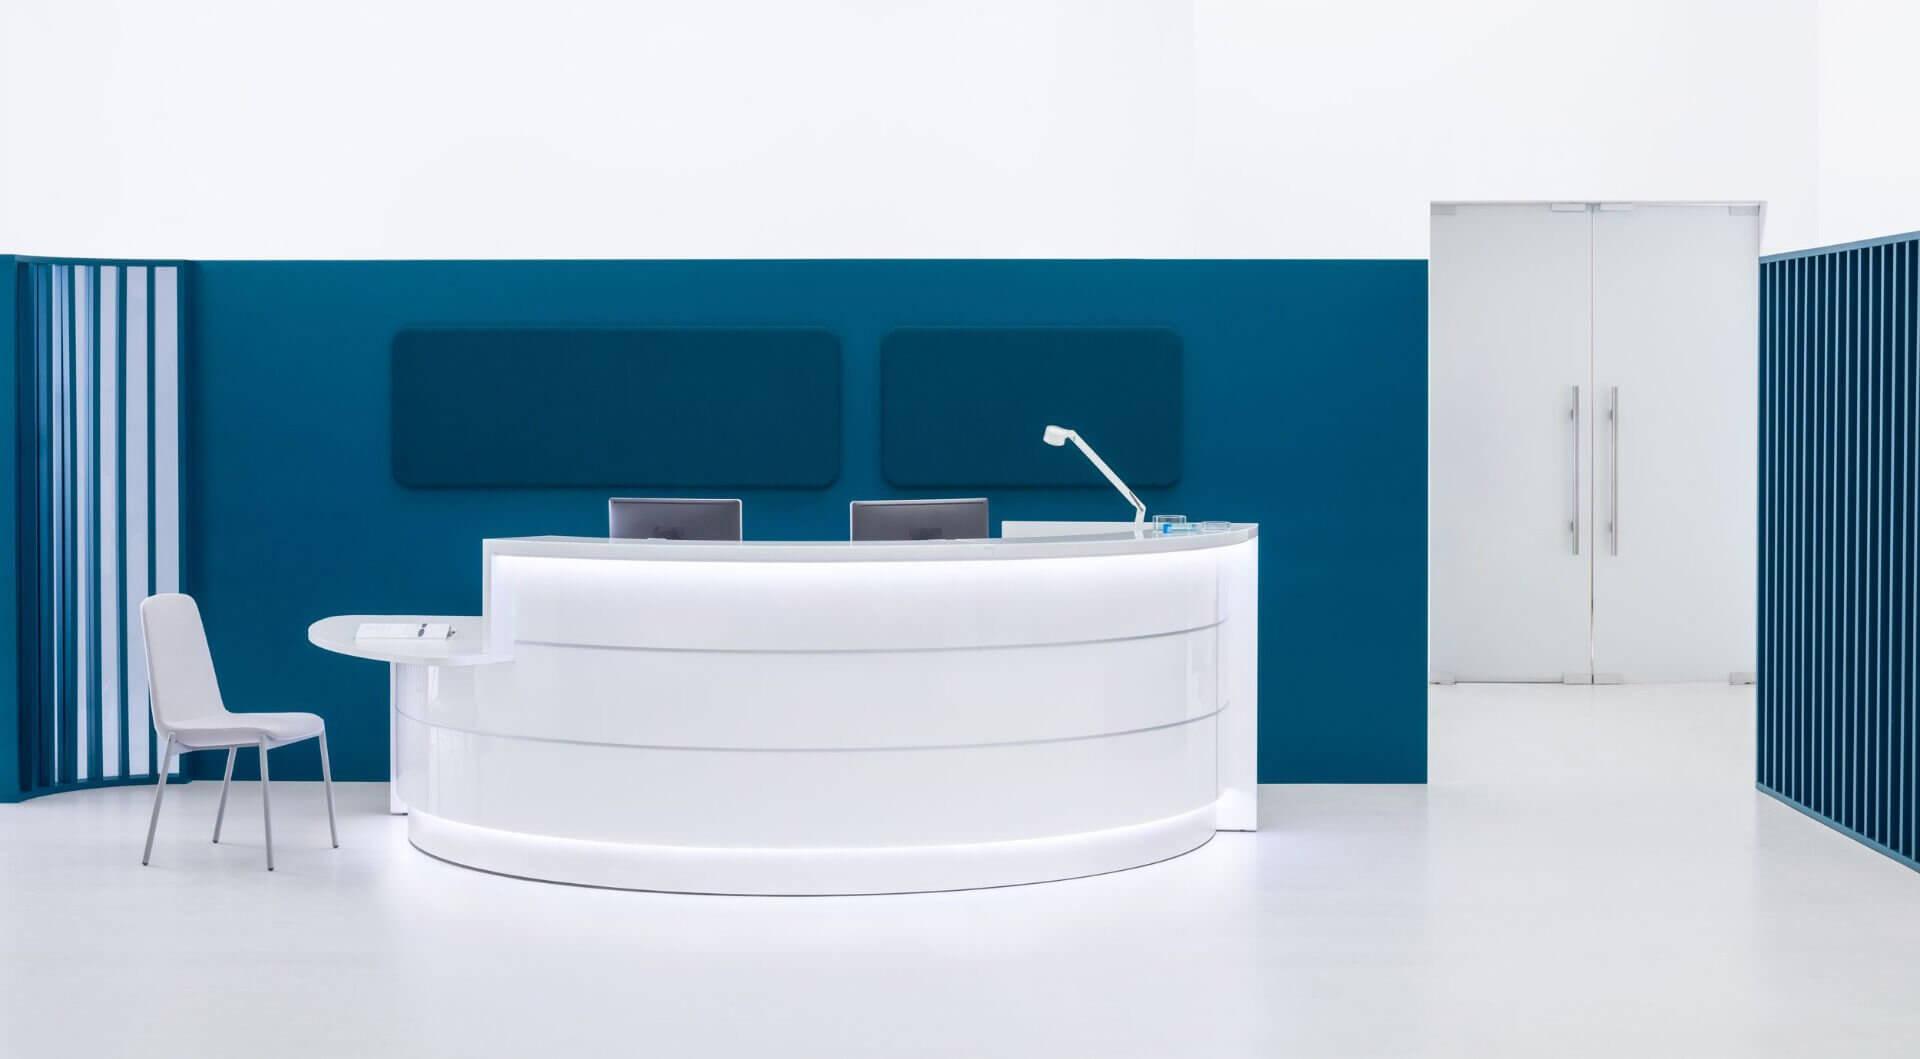 Banque d'accueil ronde design PMR.